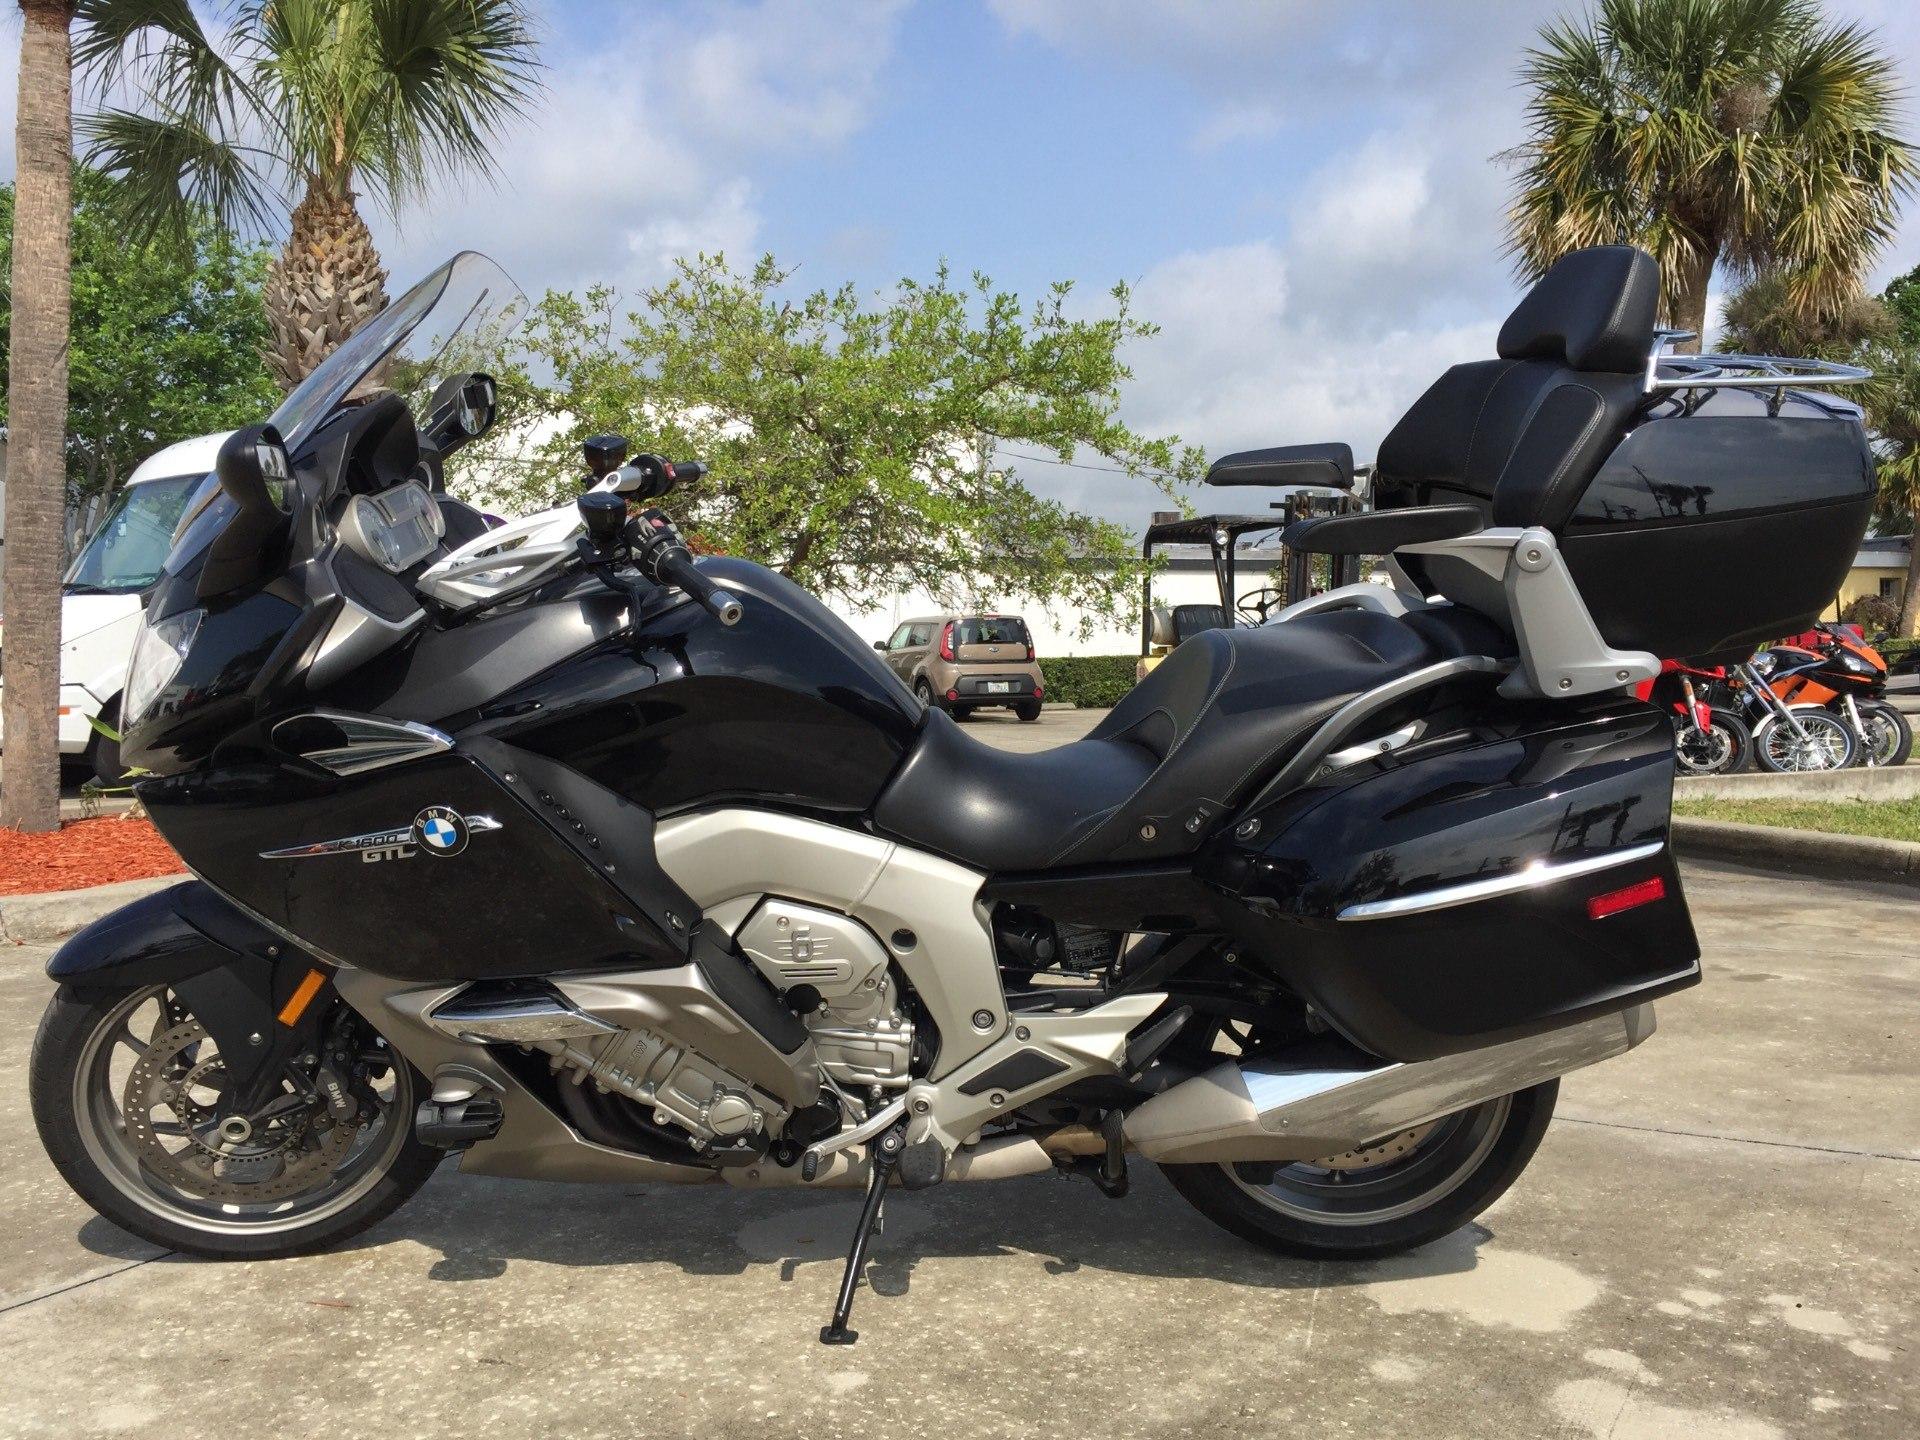 2015 BMW K 1600 GTL in Daytona Beach, Florida